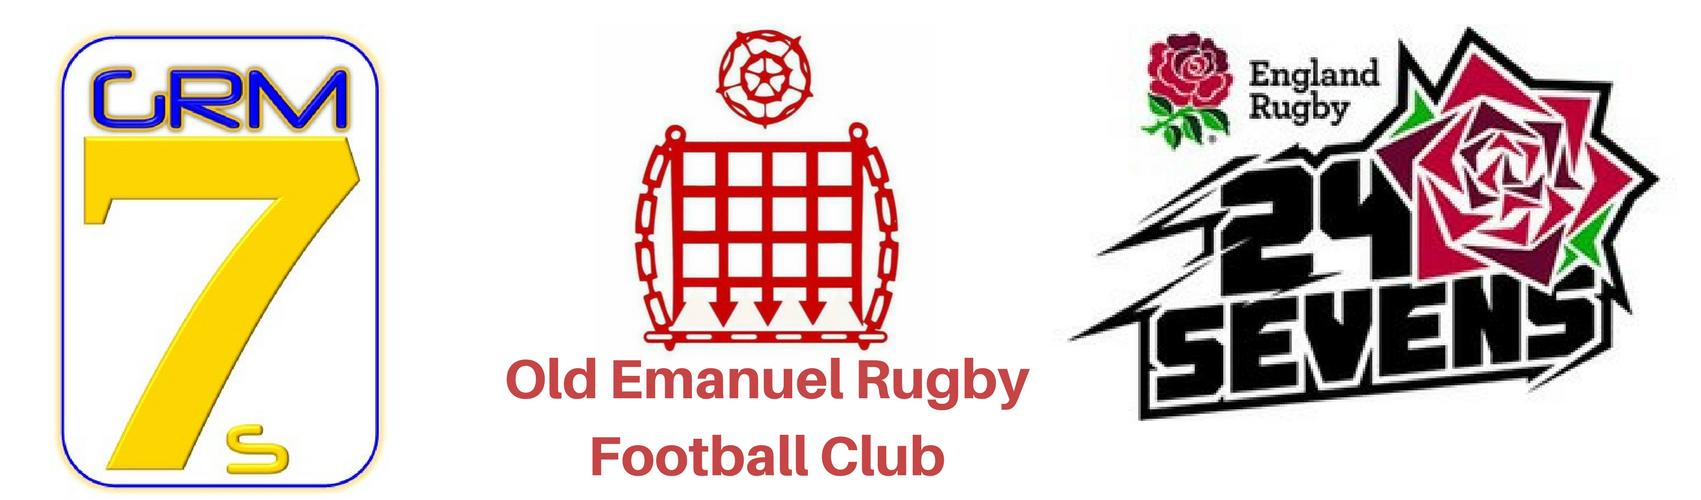 GRM7s, Old Emanuel Rugby Football Club